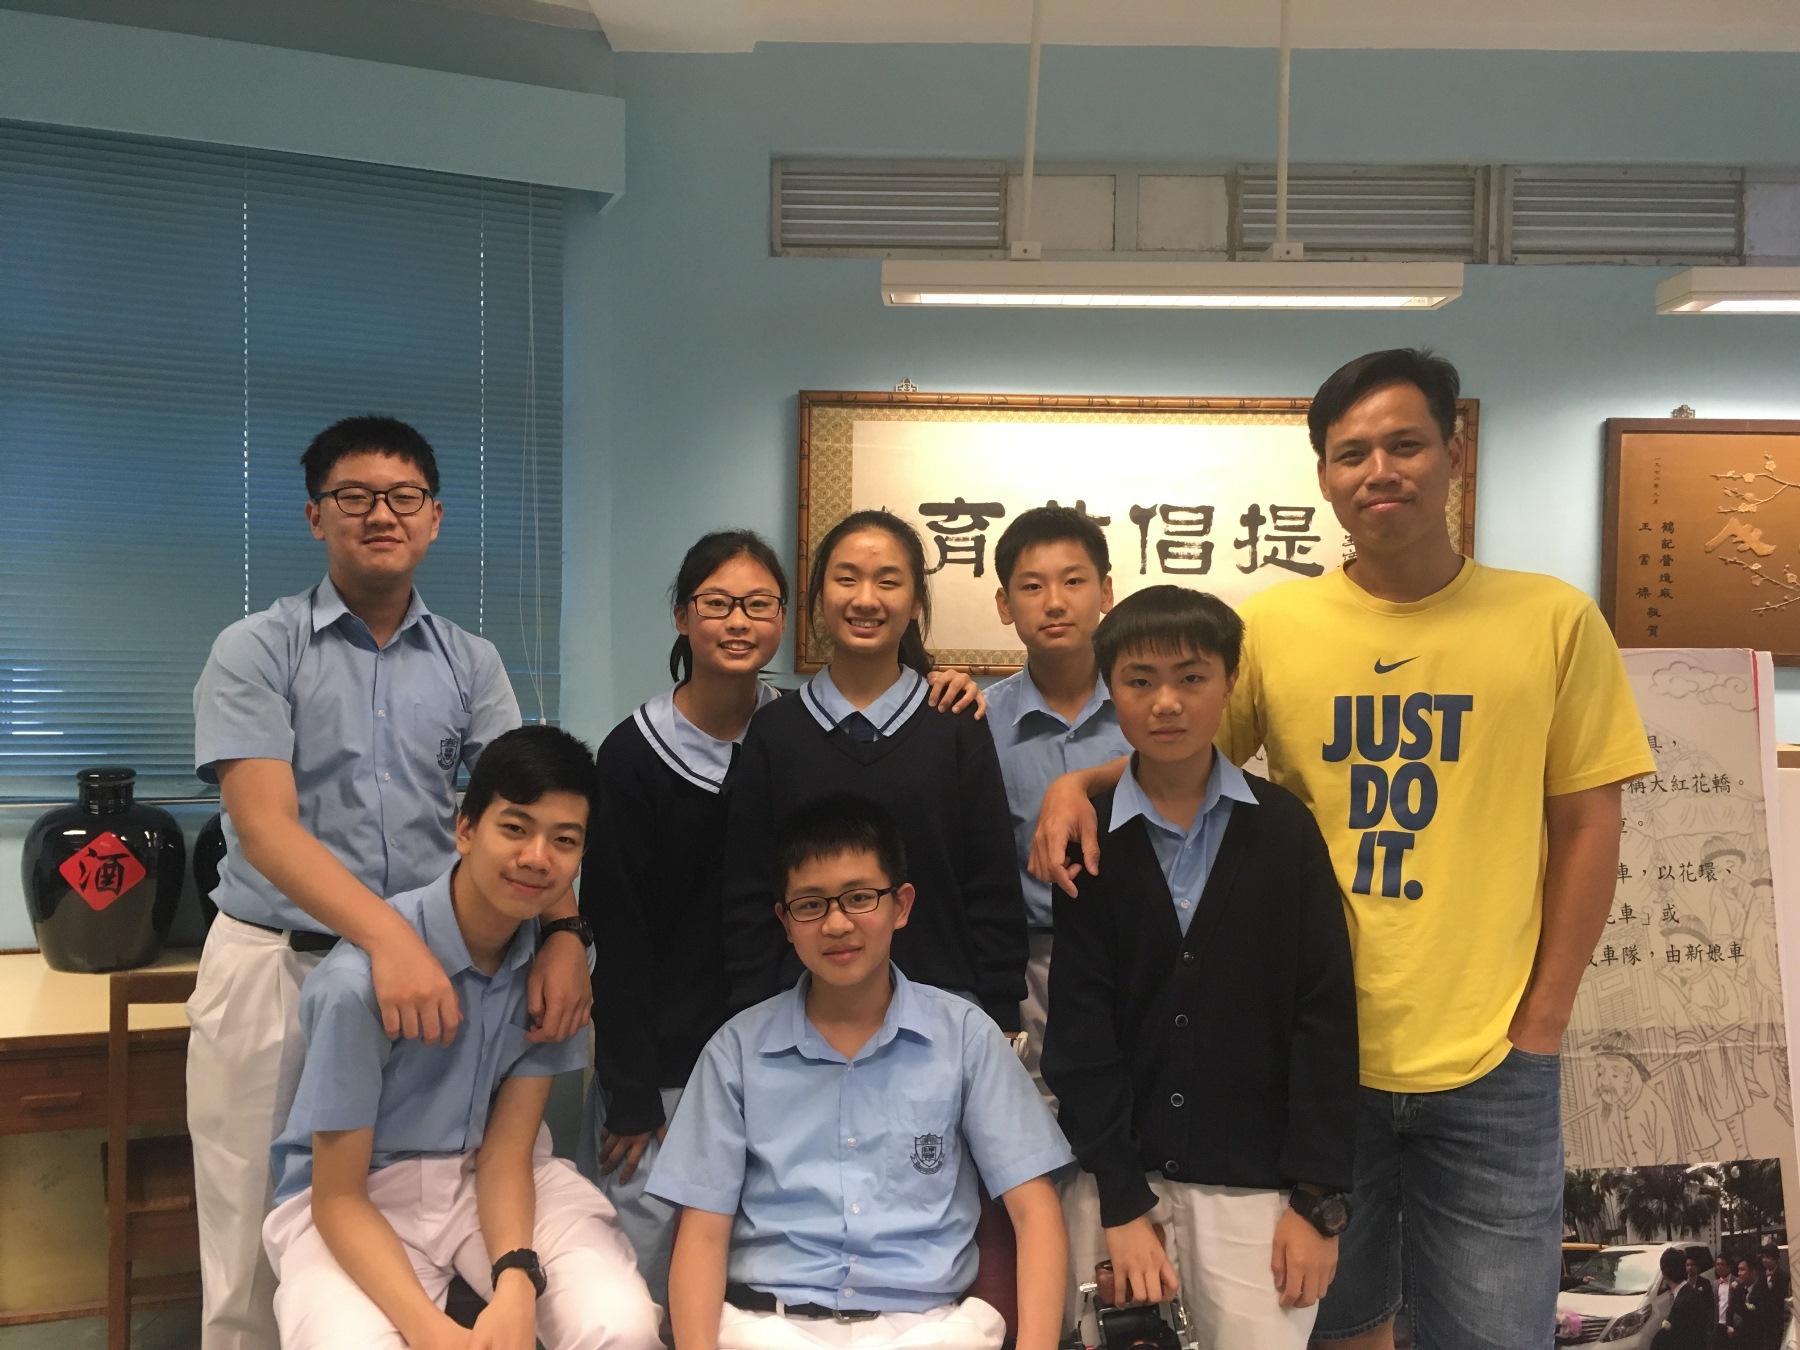 http://npc.edu.hk/sites/default/files/img_2321.jpg